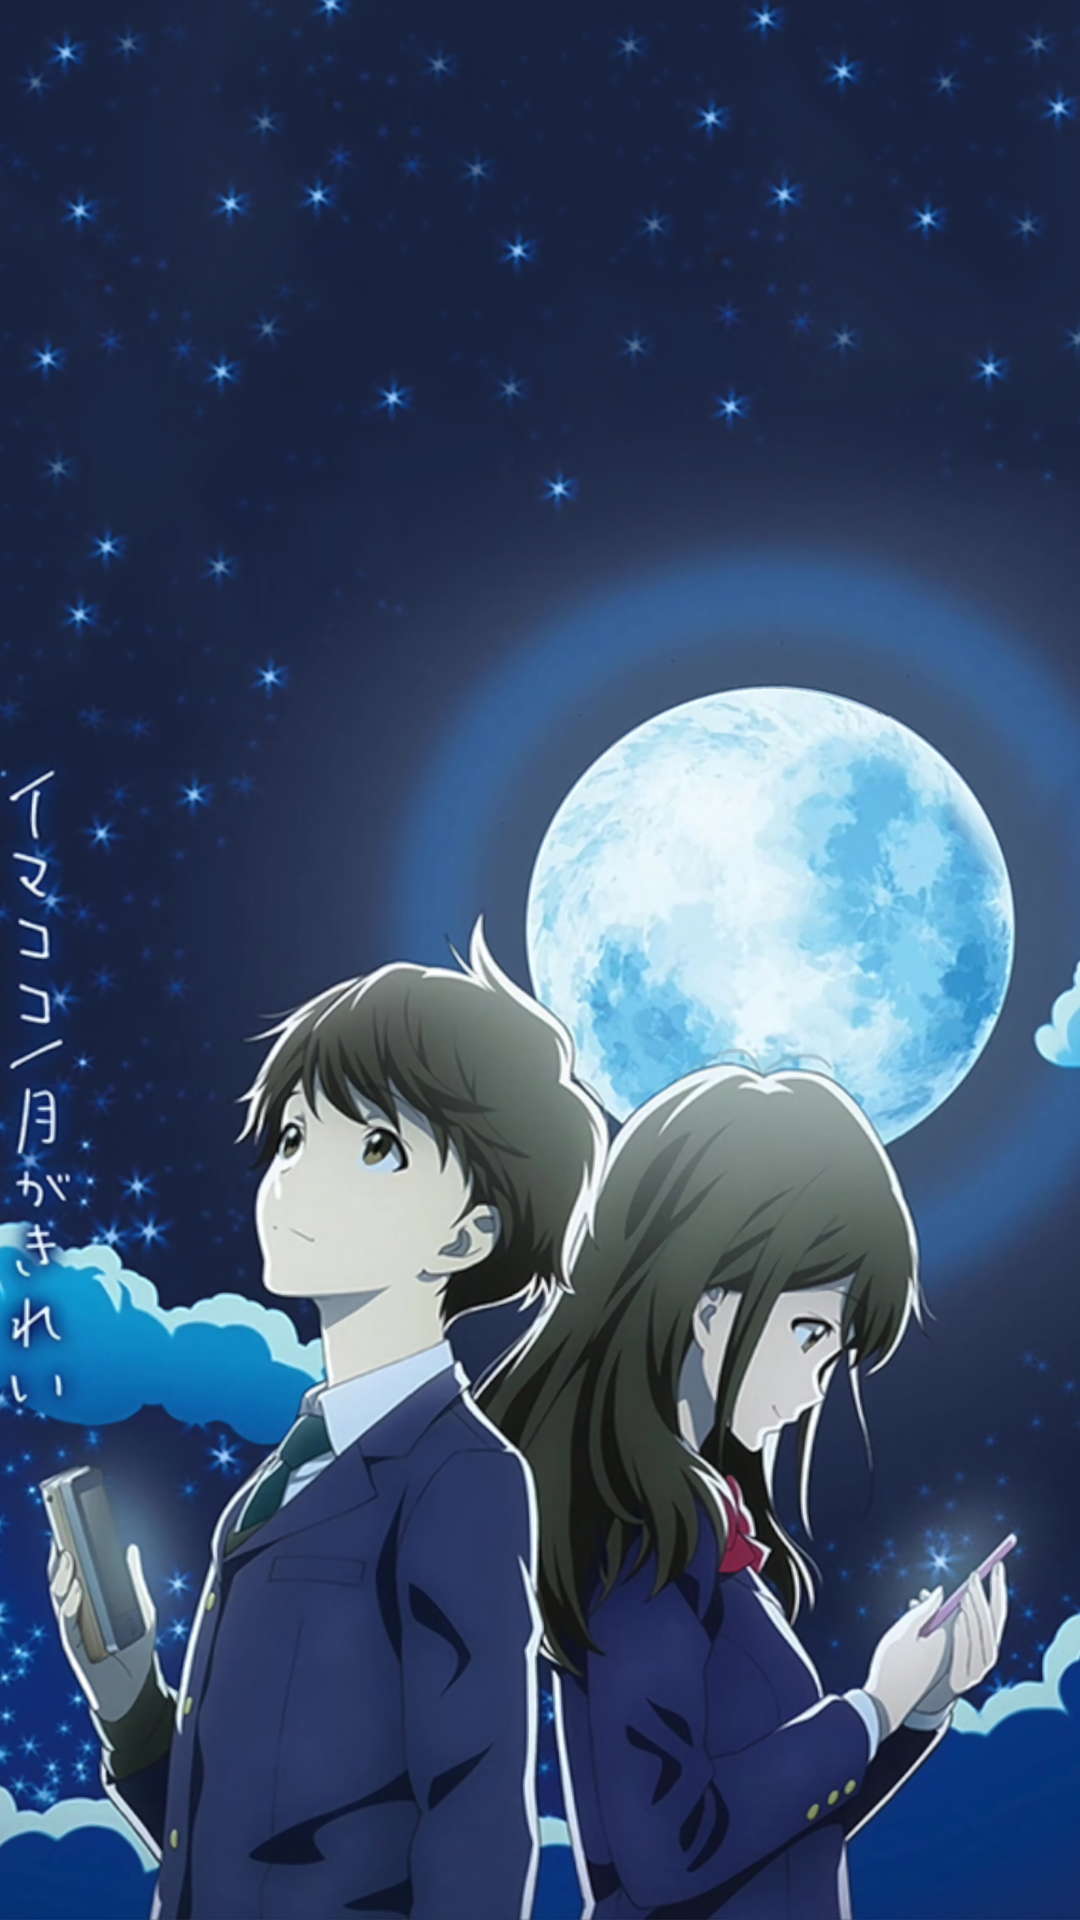 Anime Wallpaper Romantic Wallpaper Nice In 2020 Romantic Anime Anime Anime Backgrounds Wallpapers